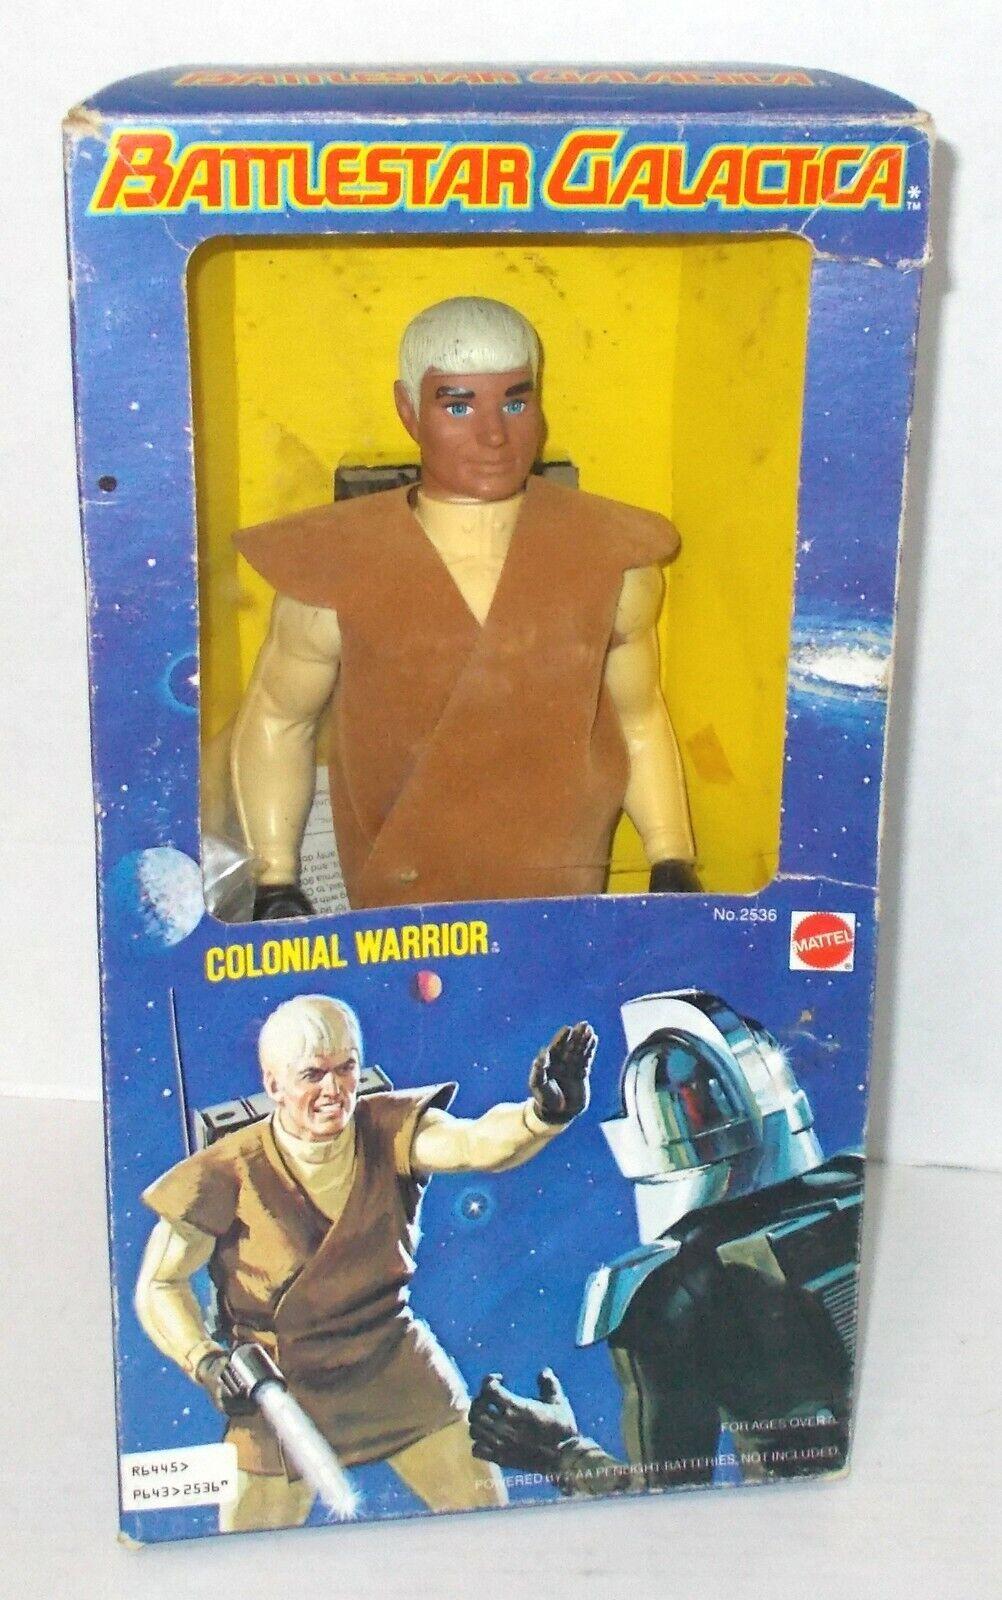 Mattel battleSTAR GALACTICA COLONIAL WARRIOR FIGURE 1978 NMIB NEAR MINT IN BOX